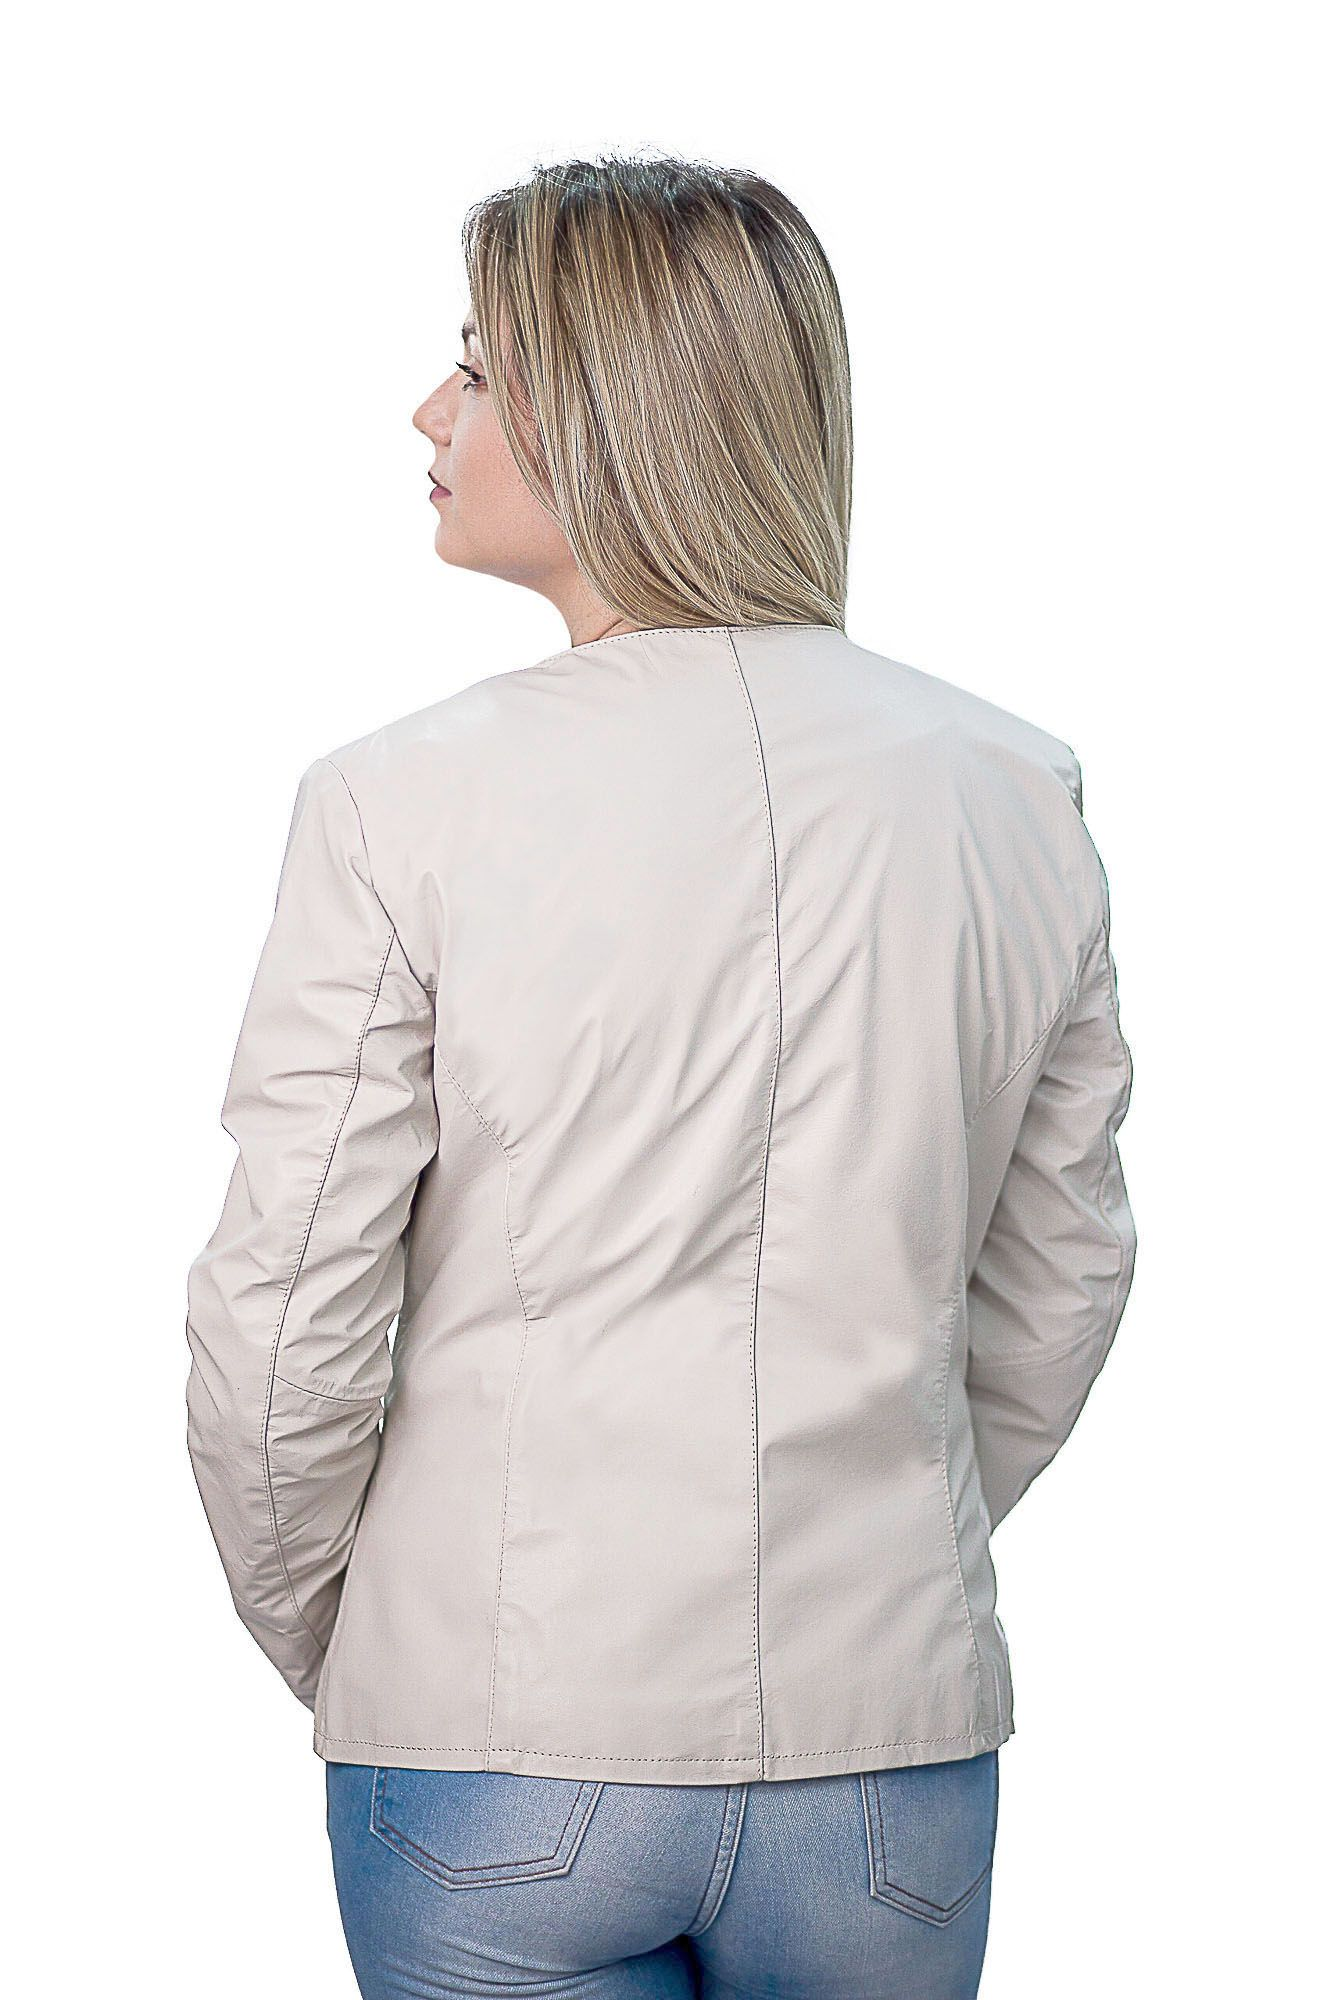 Jaqueta Feminina Prata Couro 210 Marfim